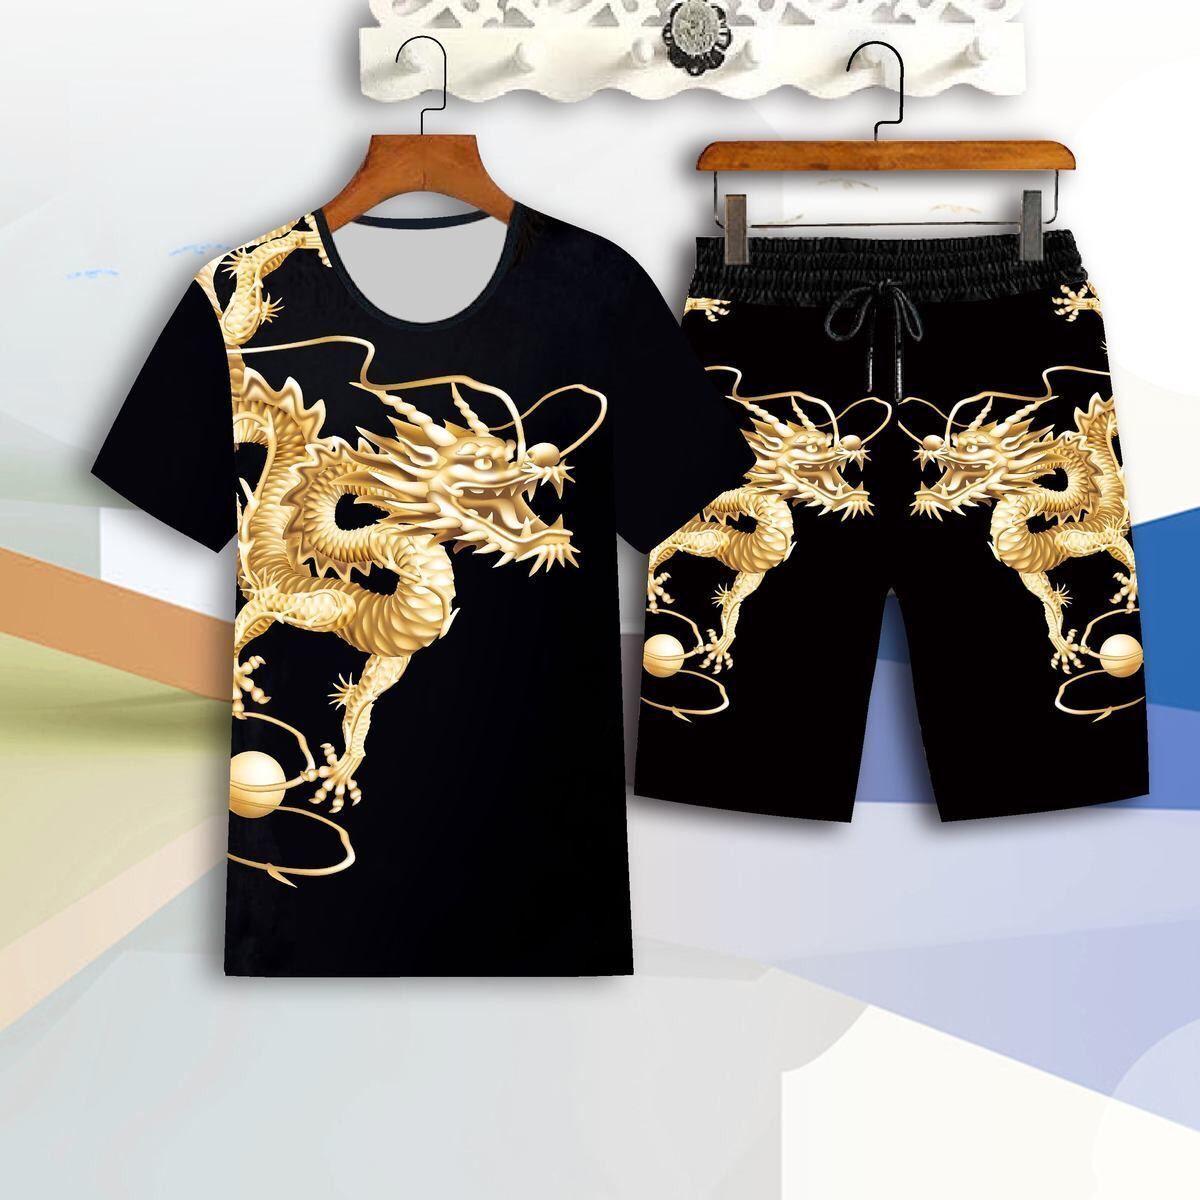 Suit men's short-sleeved T-shirt summer tide brand 2021 new loose trend clothes a set of handsome summer clothes tide